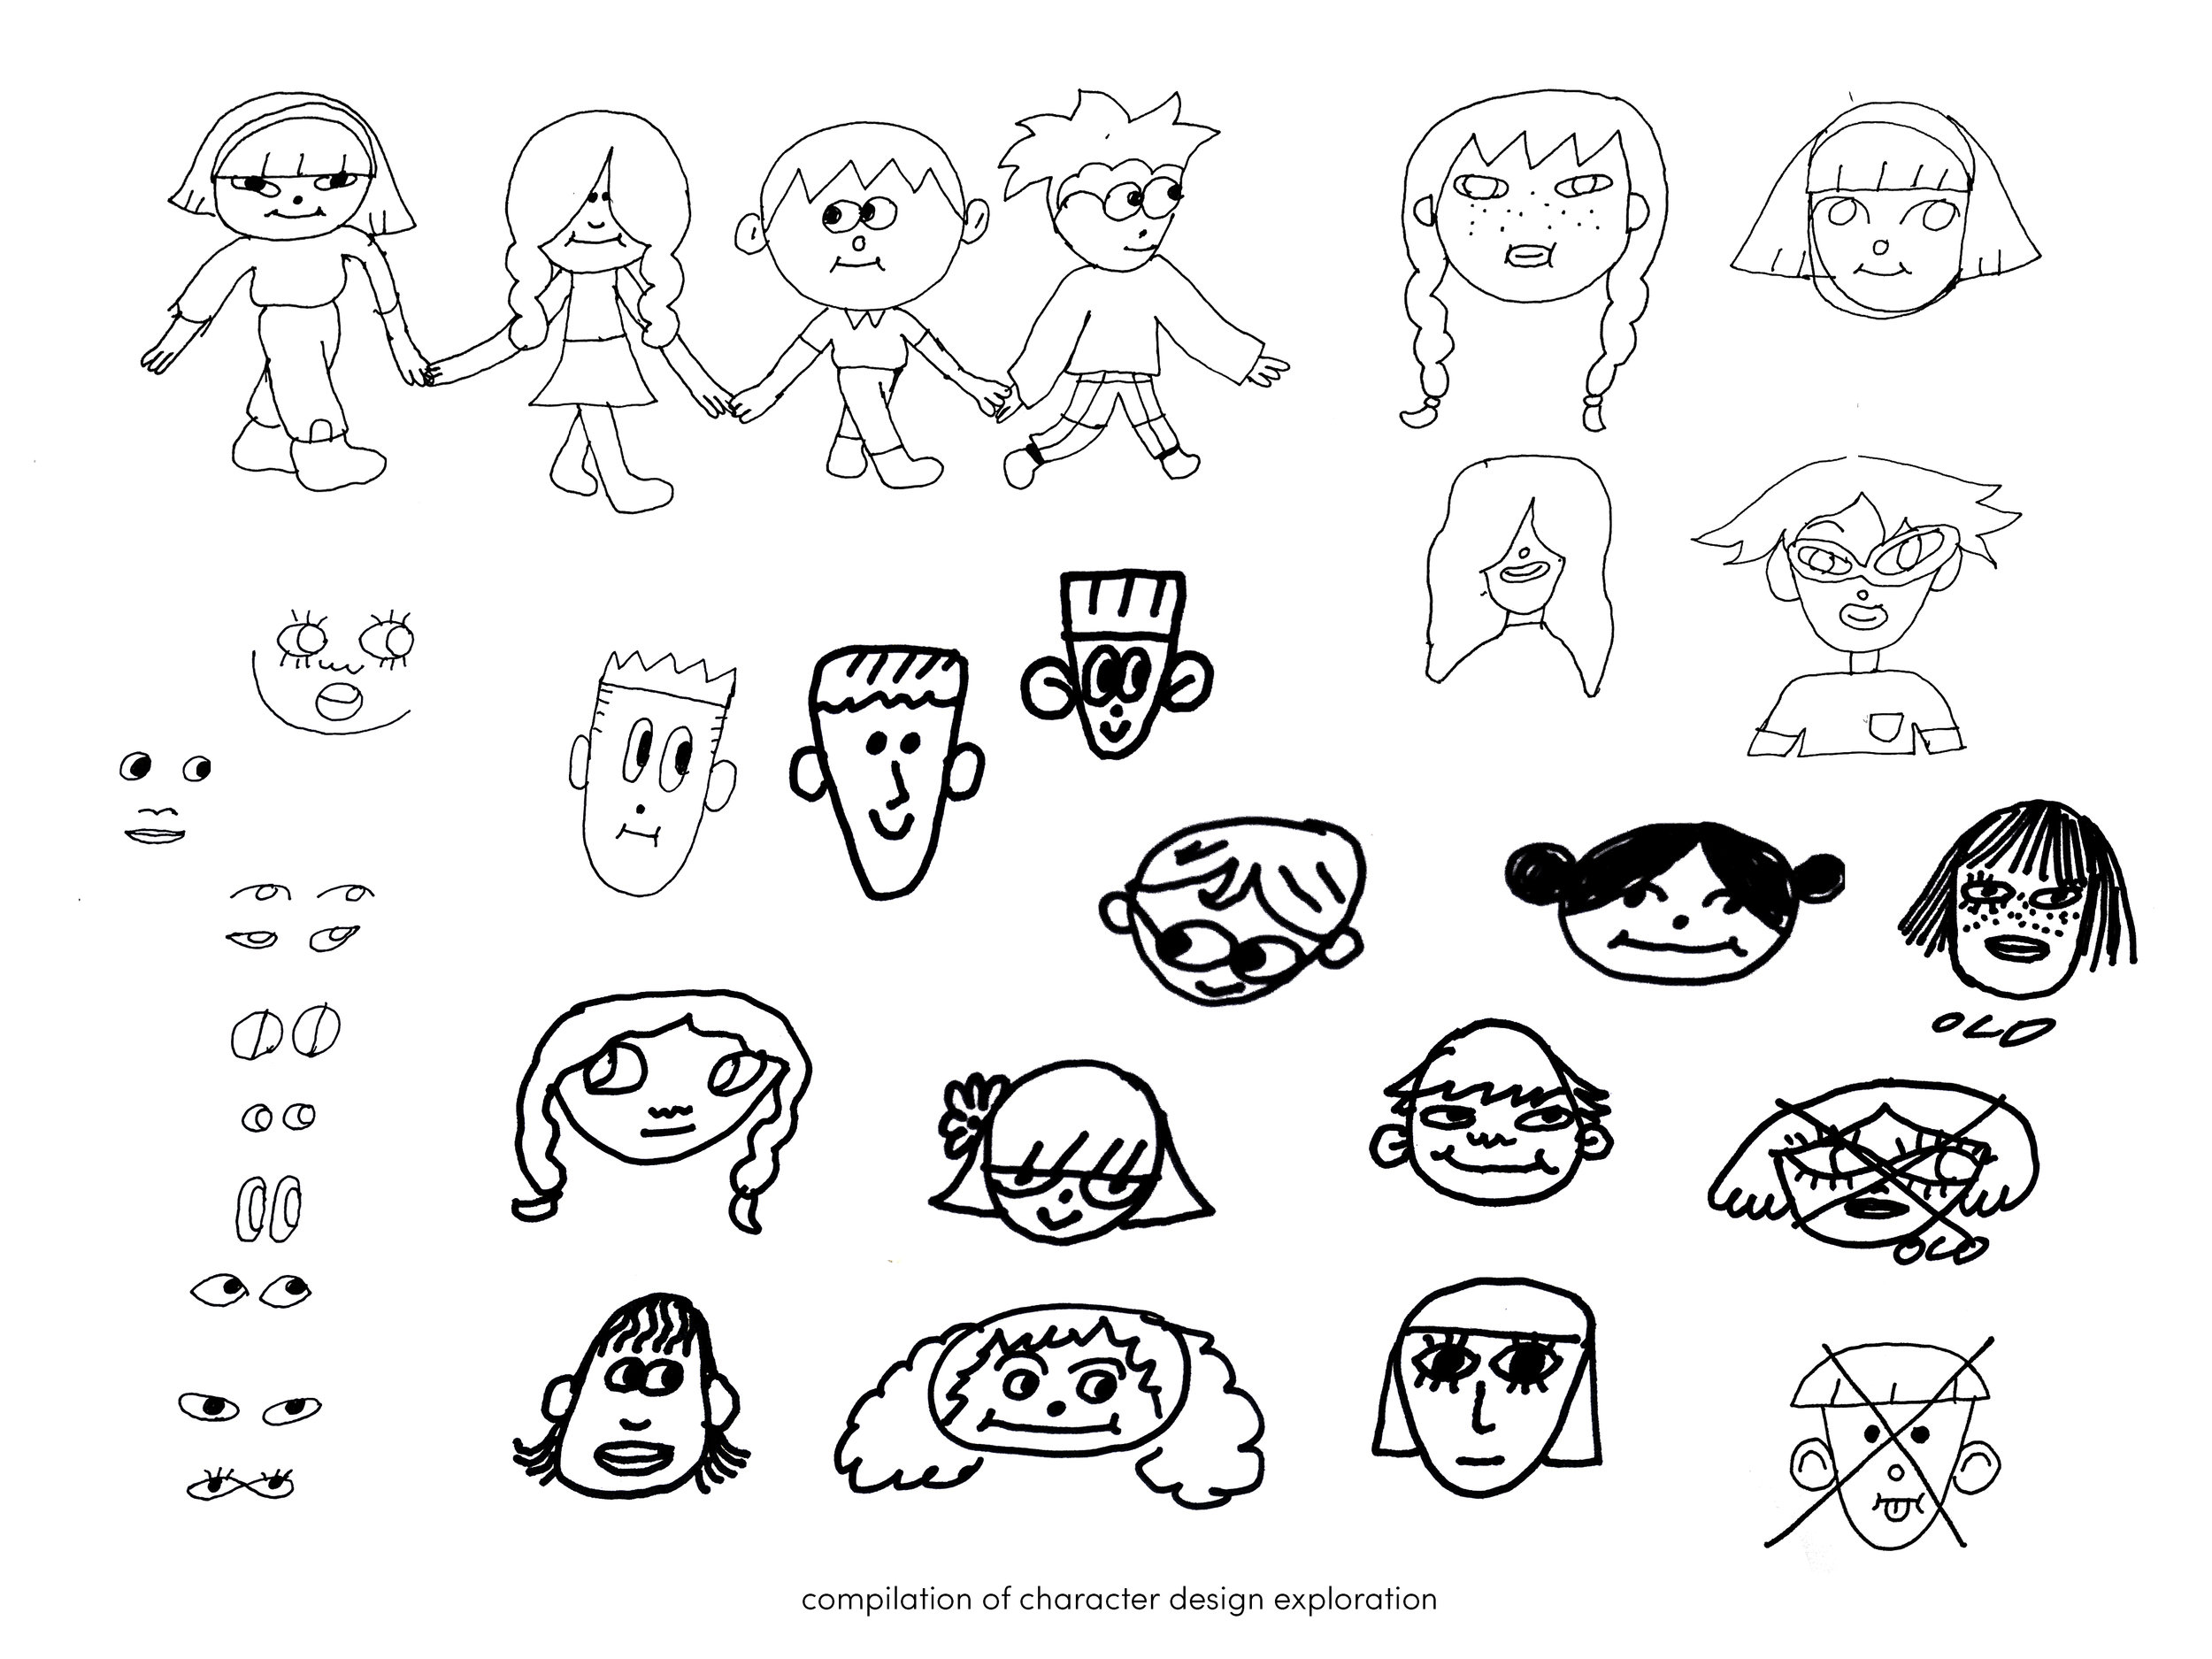 character design exploration.jpg